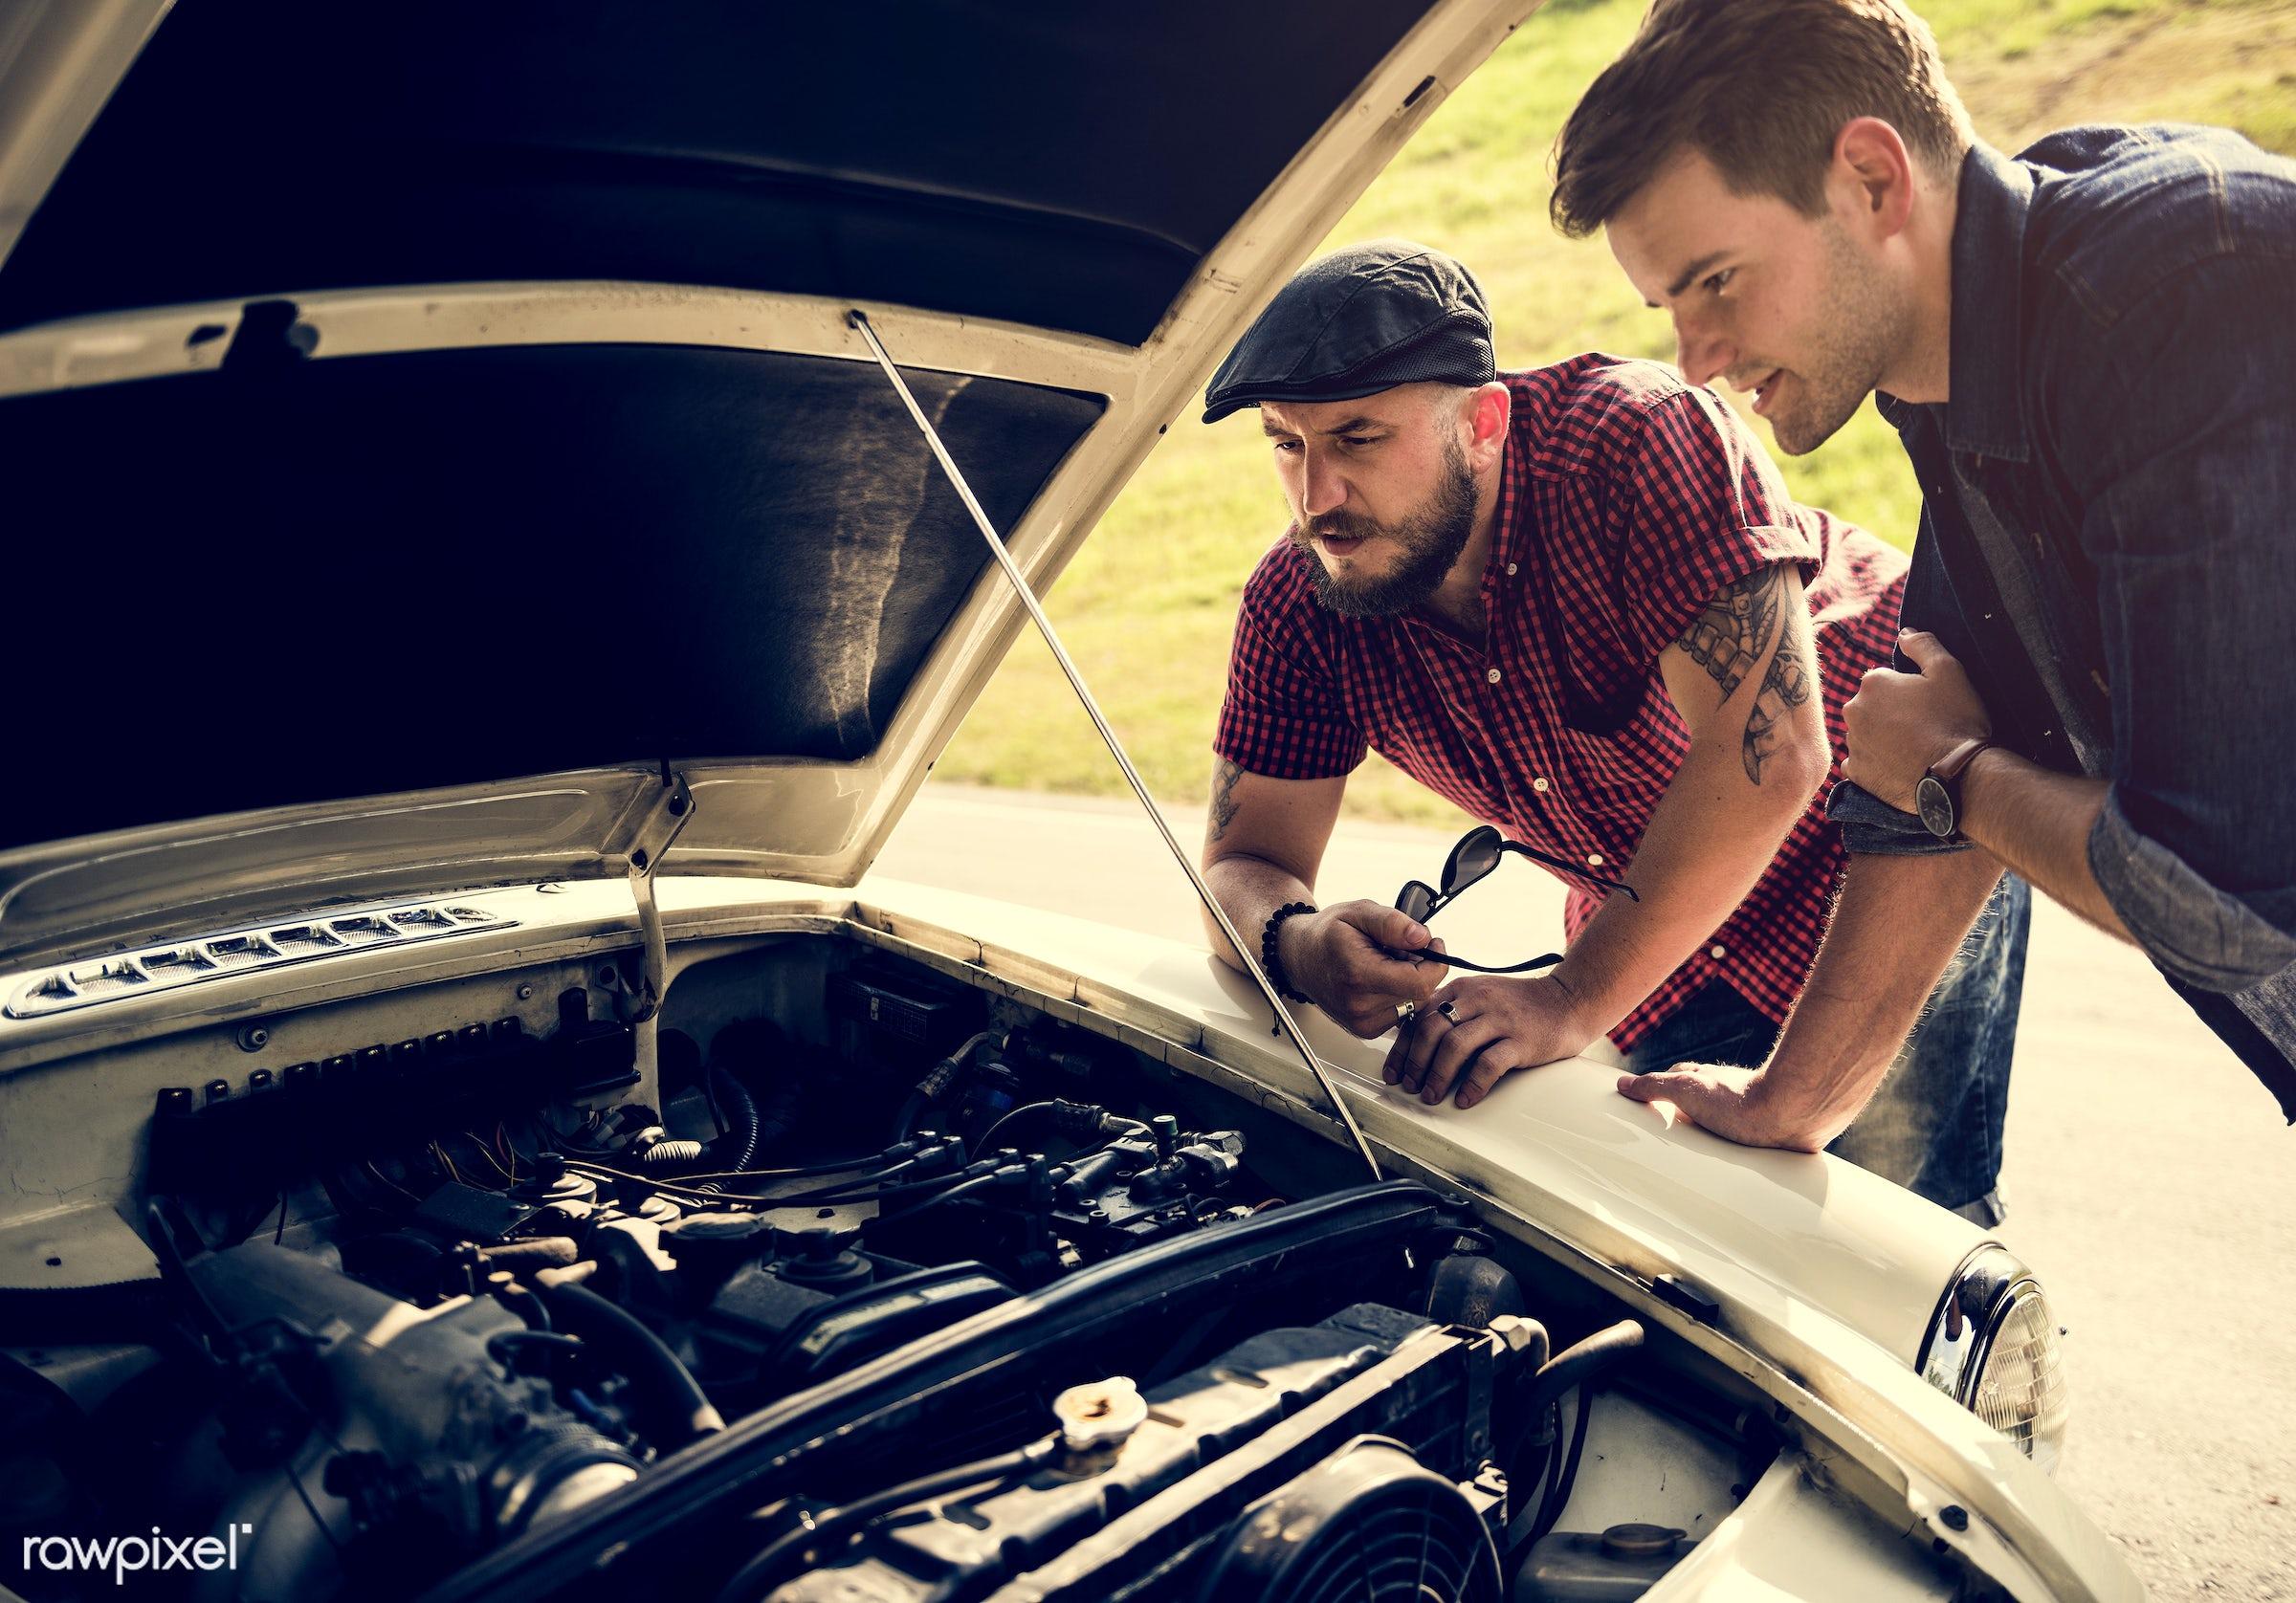 car, automobile, street, vehicle, road, travel, heat, trouble, help, transport, motor, driver, repair, men, hood, man,...